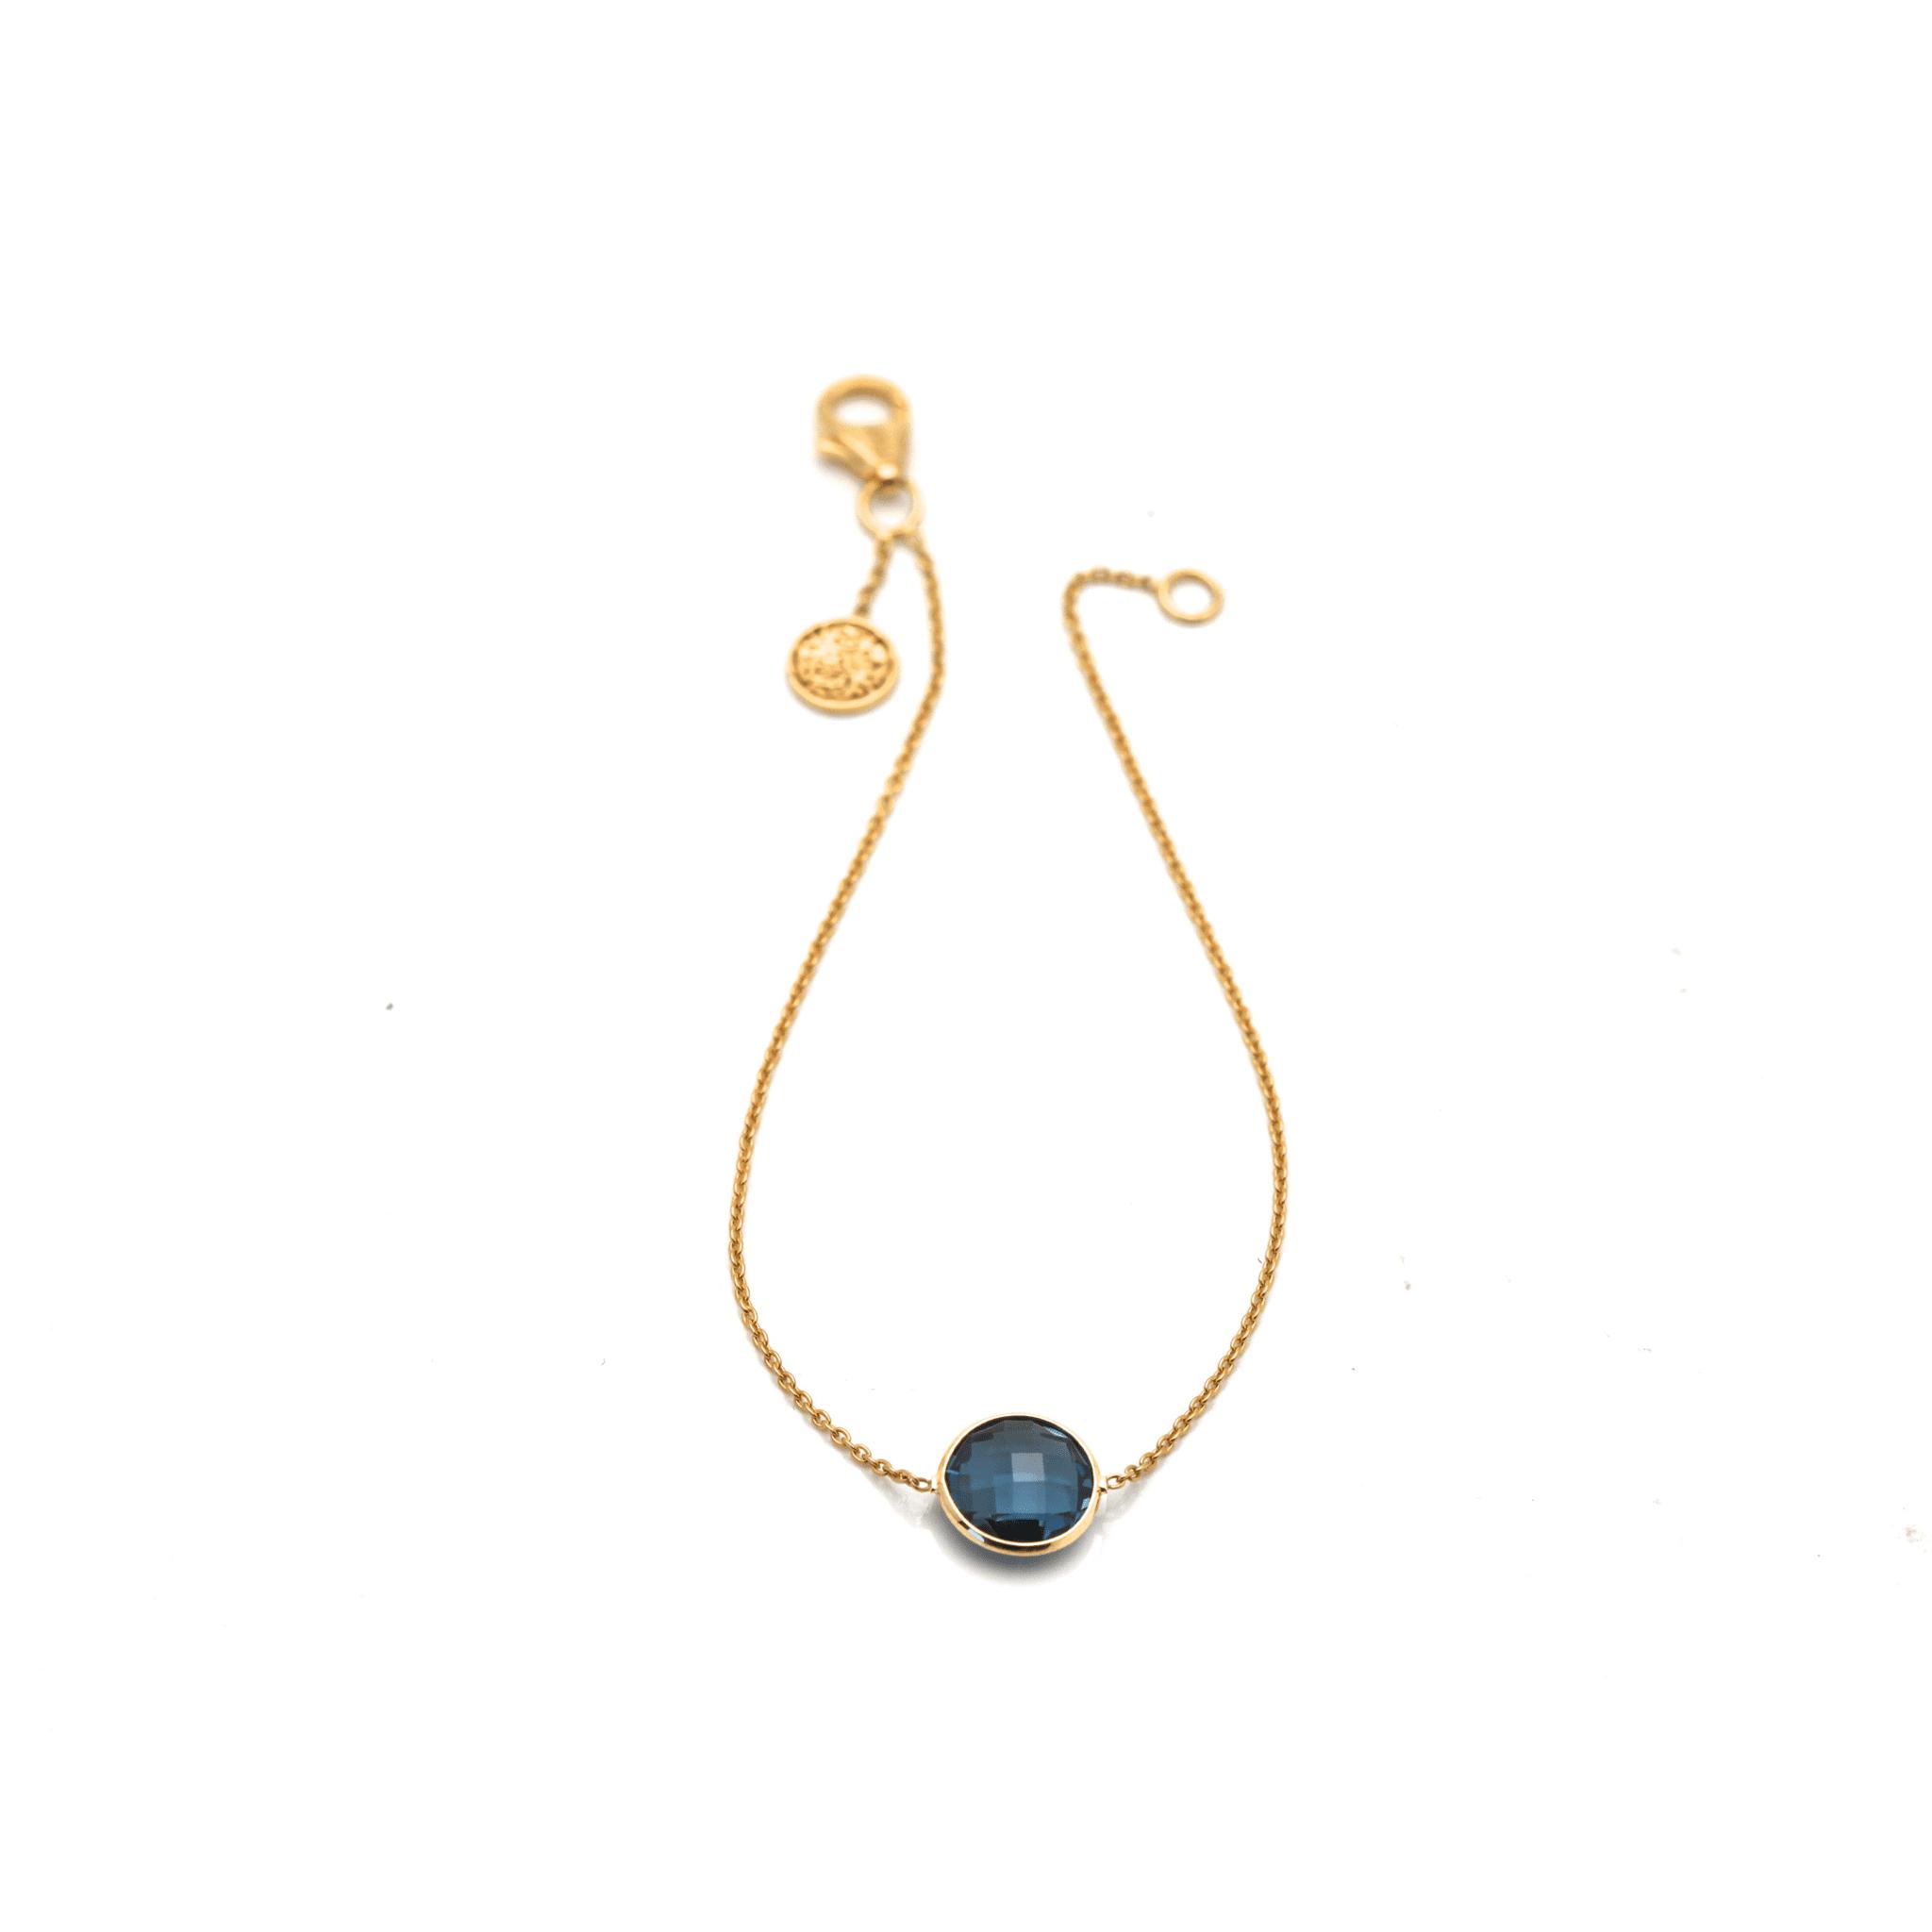 Tresor Collection - Gemstone Single Stone Bracelet In 18k Yellow Gold